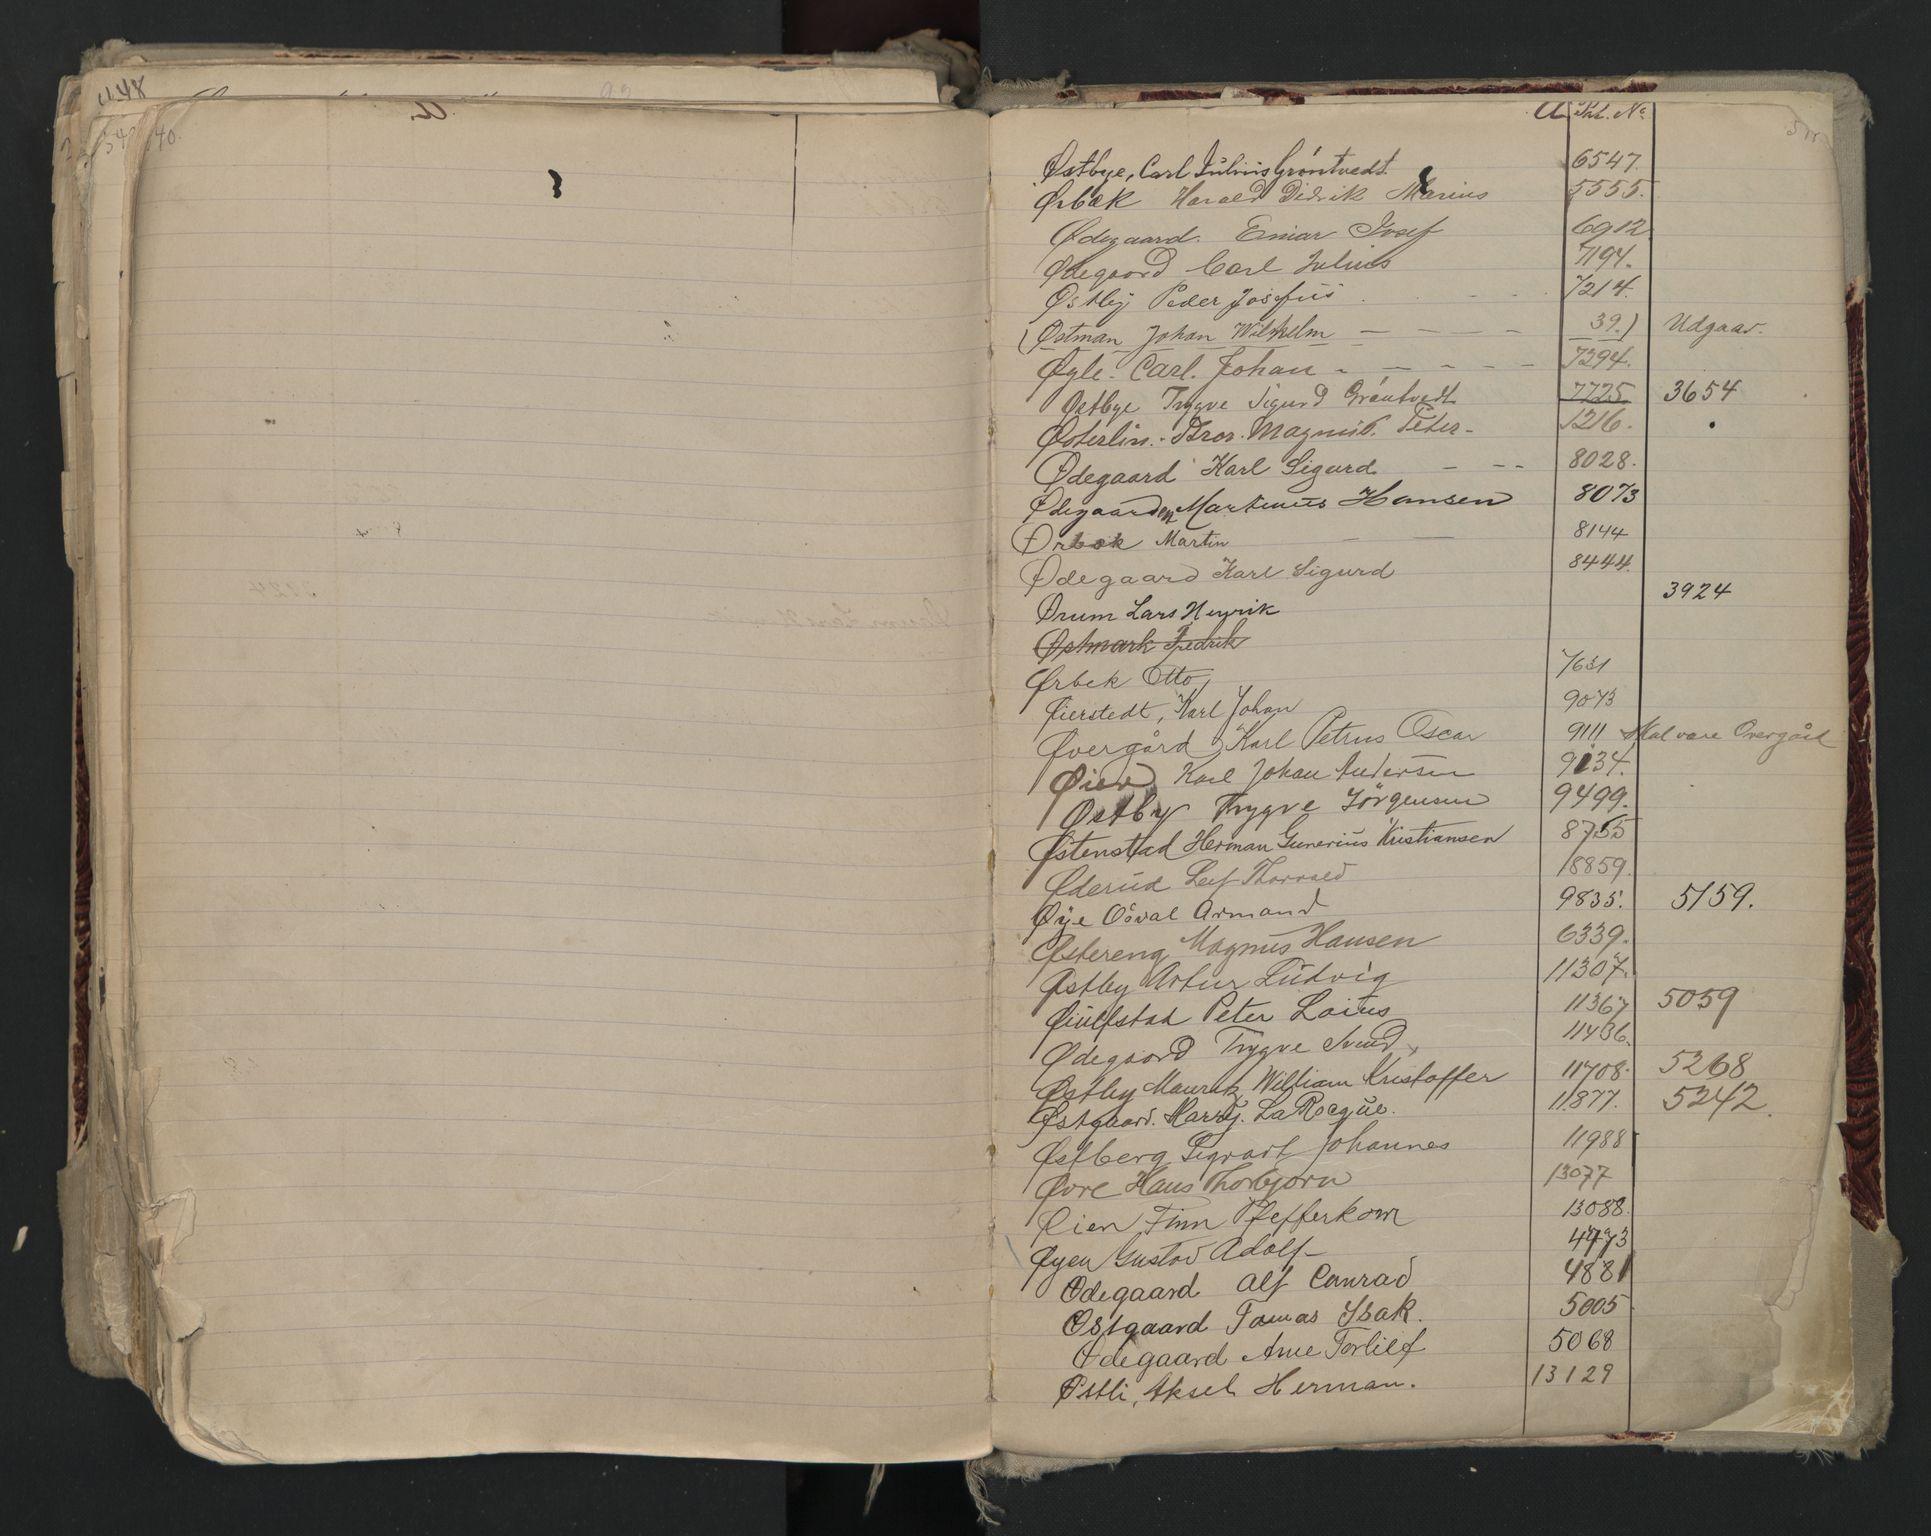 SAO, Oslo sjømannskontor, F/Fa/L0002: Register for Kristiania krets, 1866-1930, s. 540-541